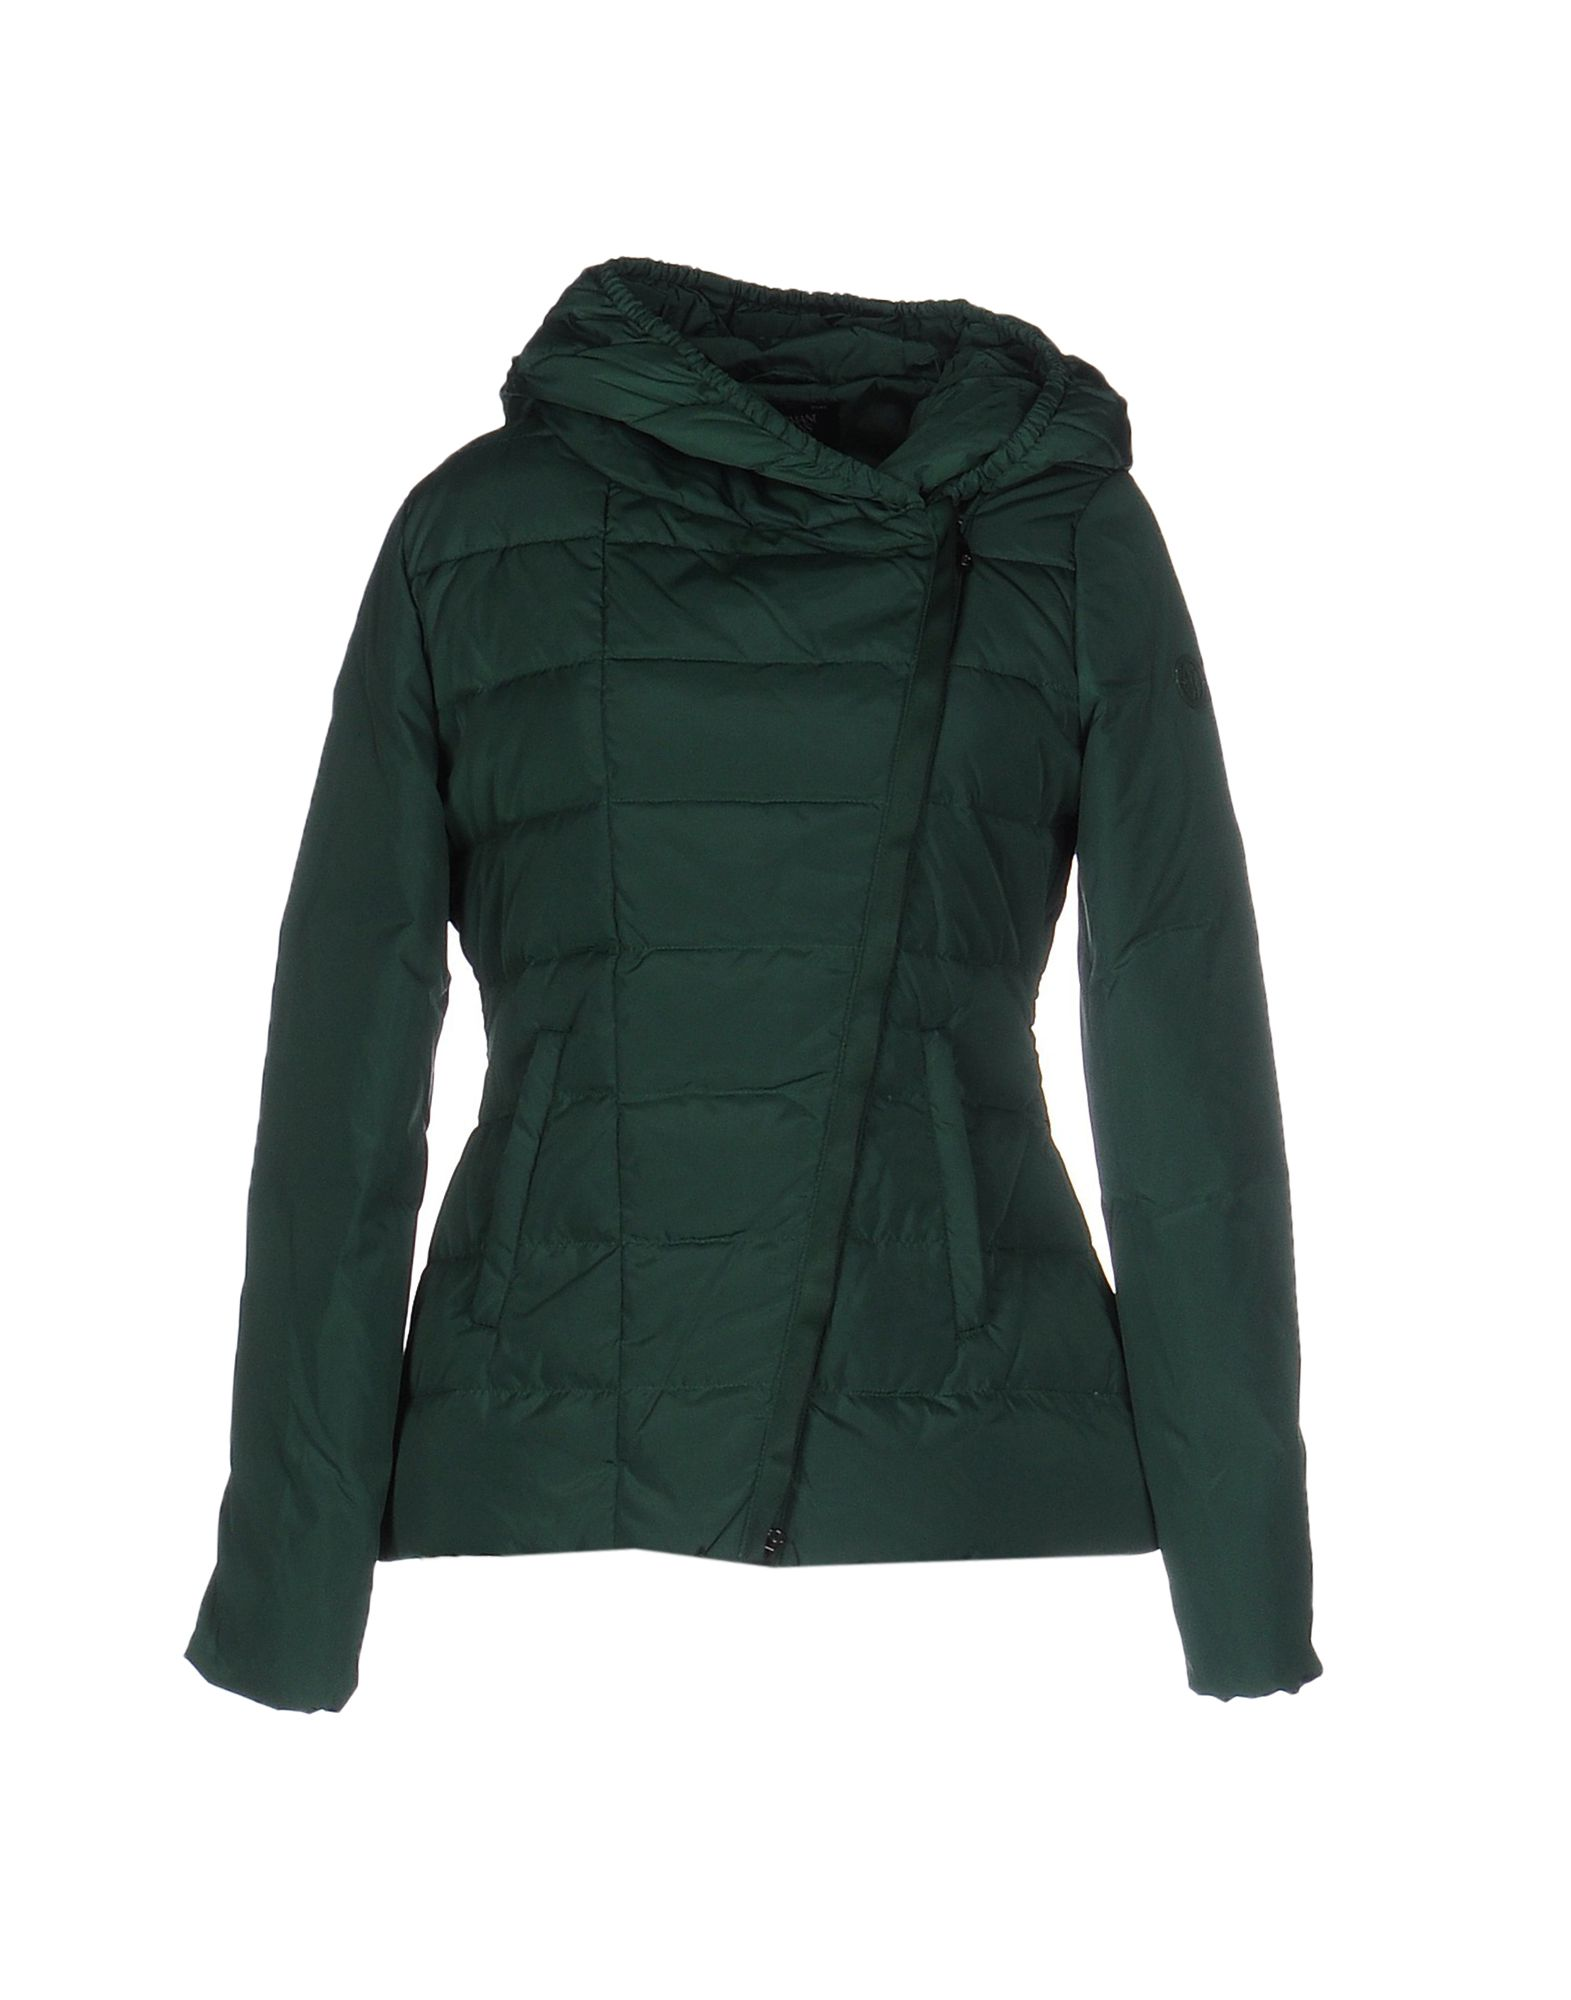 Vente armani jeans femme doudoune Gatorade Daim Vert Pas Chers ... 1e2961c32ea